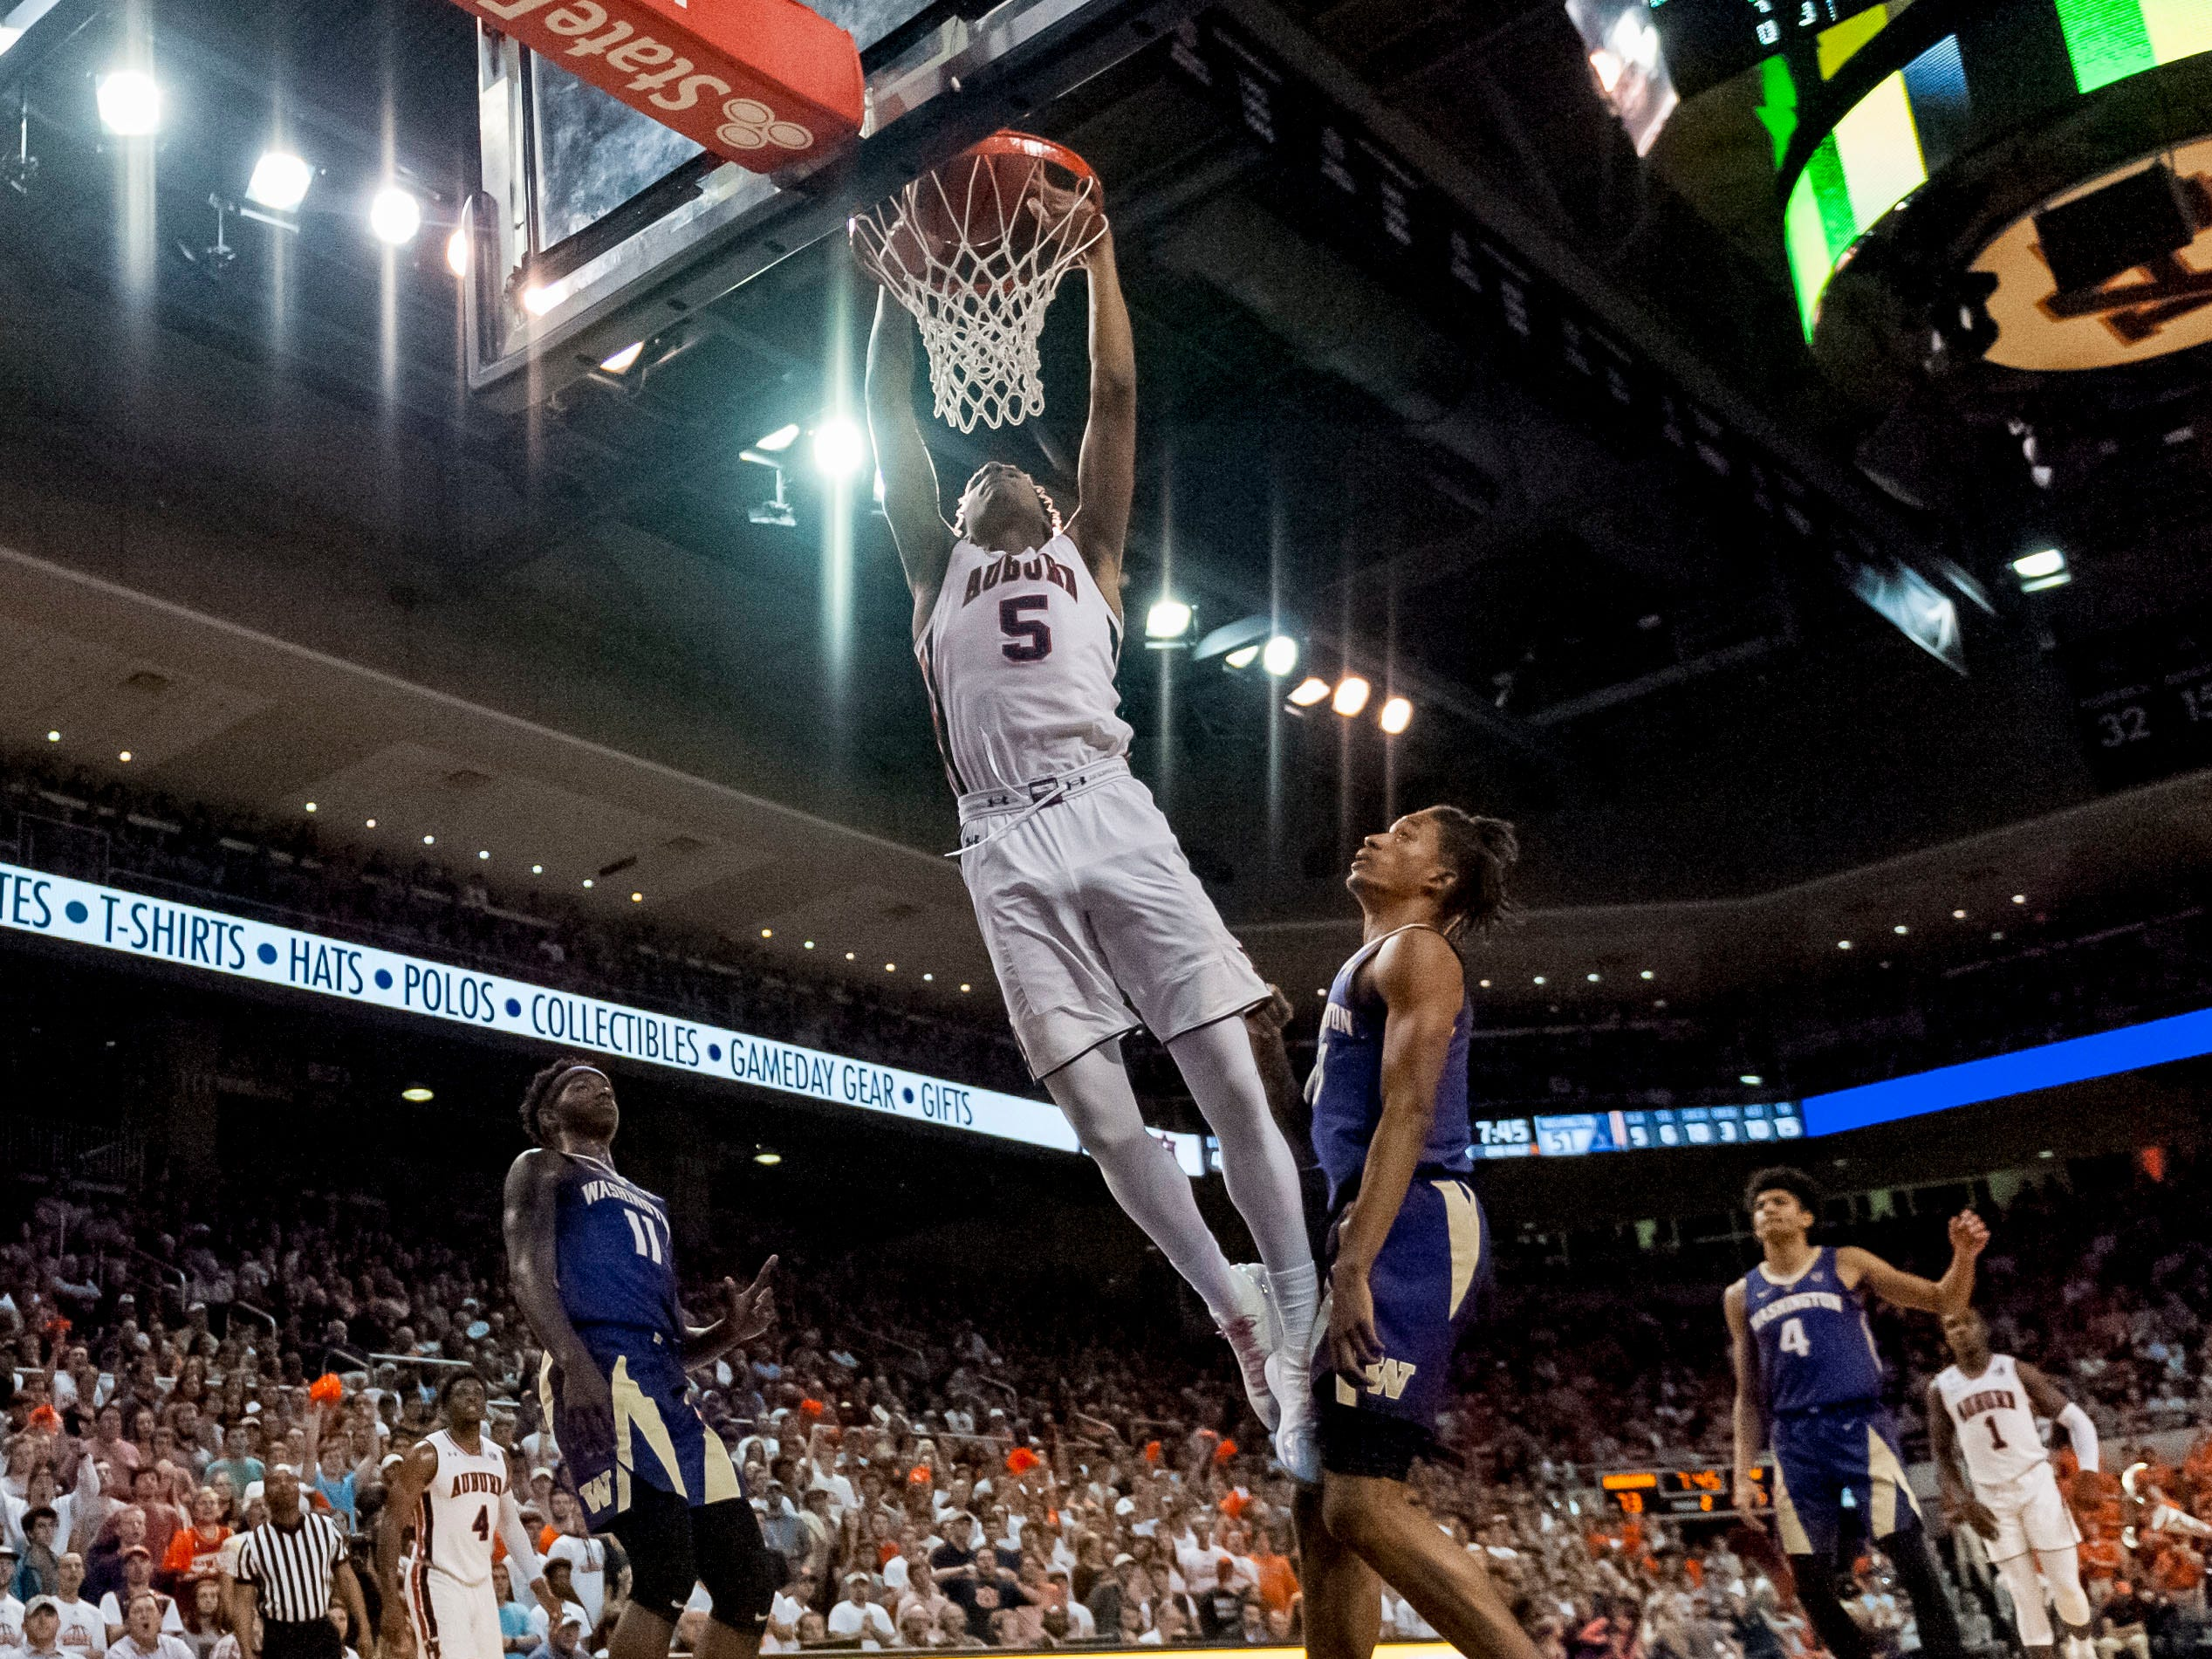 Auburn forward Chuma Okeke (5) dunks between Washington forwards Nahziah Carter (11) and Hamier Wright on Friday, Nov. 9, 2018, in Auburn, Ala.